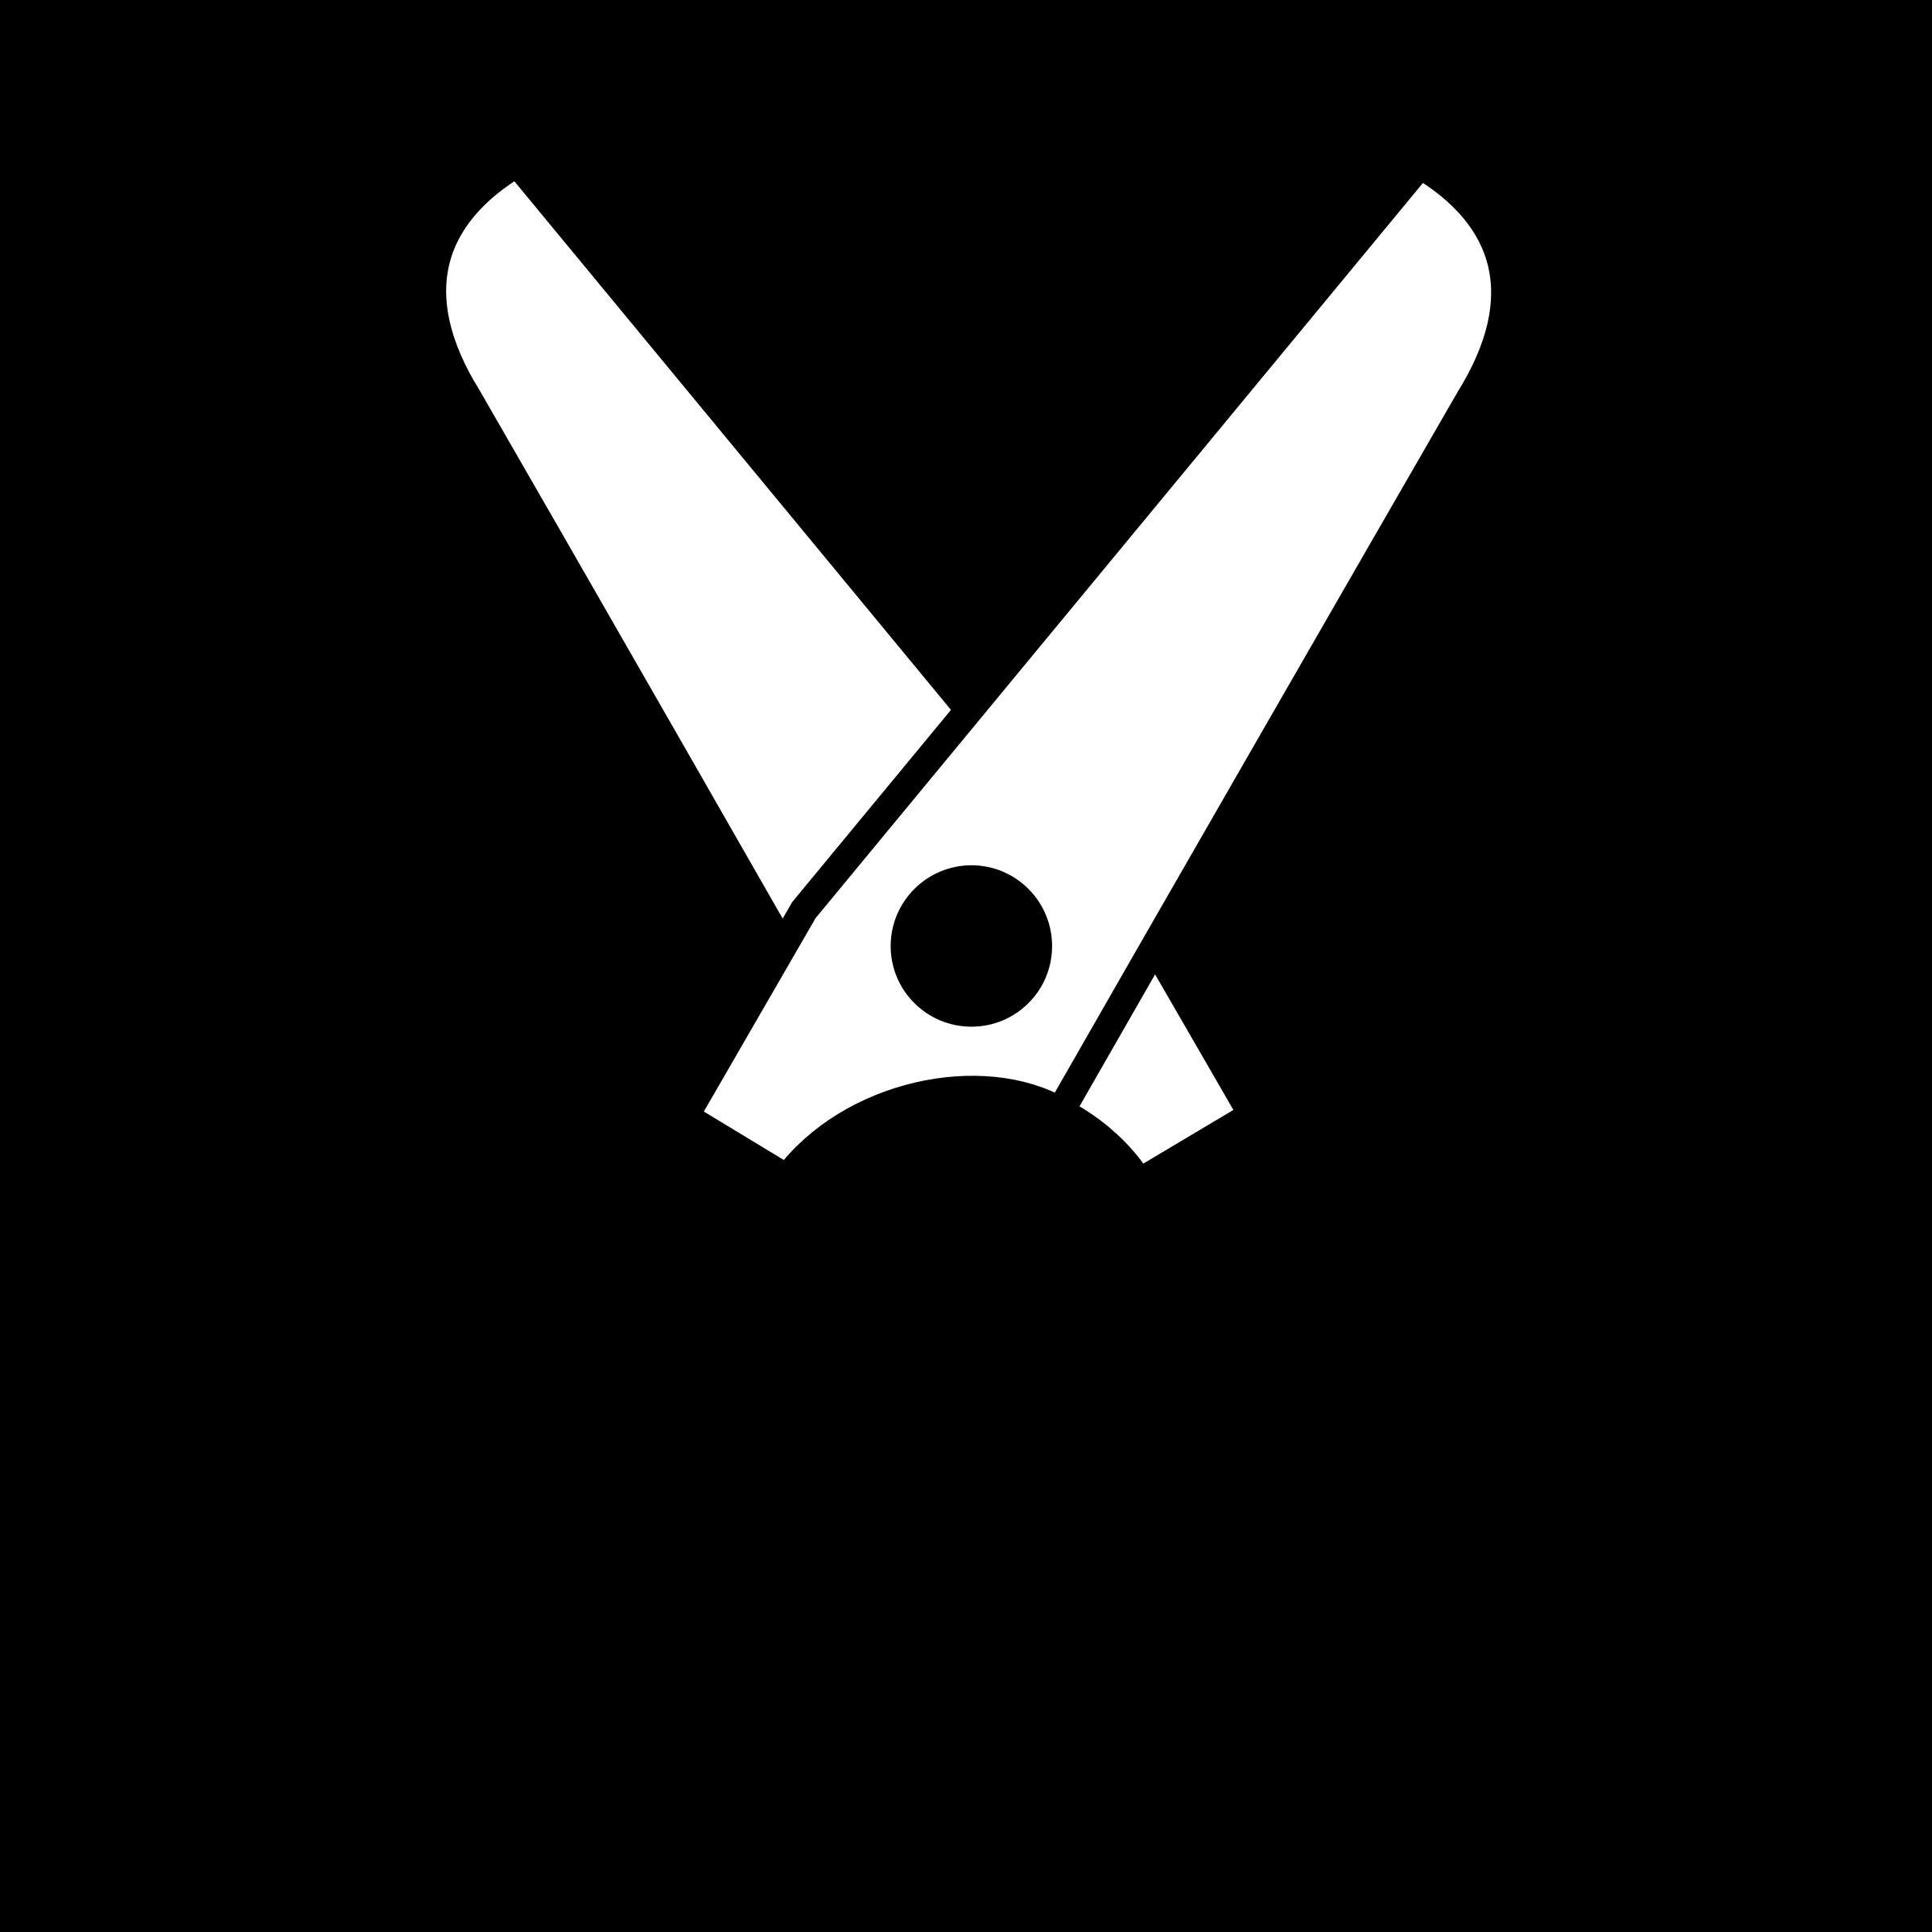 Open Scissors Clipart.